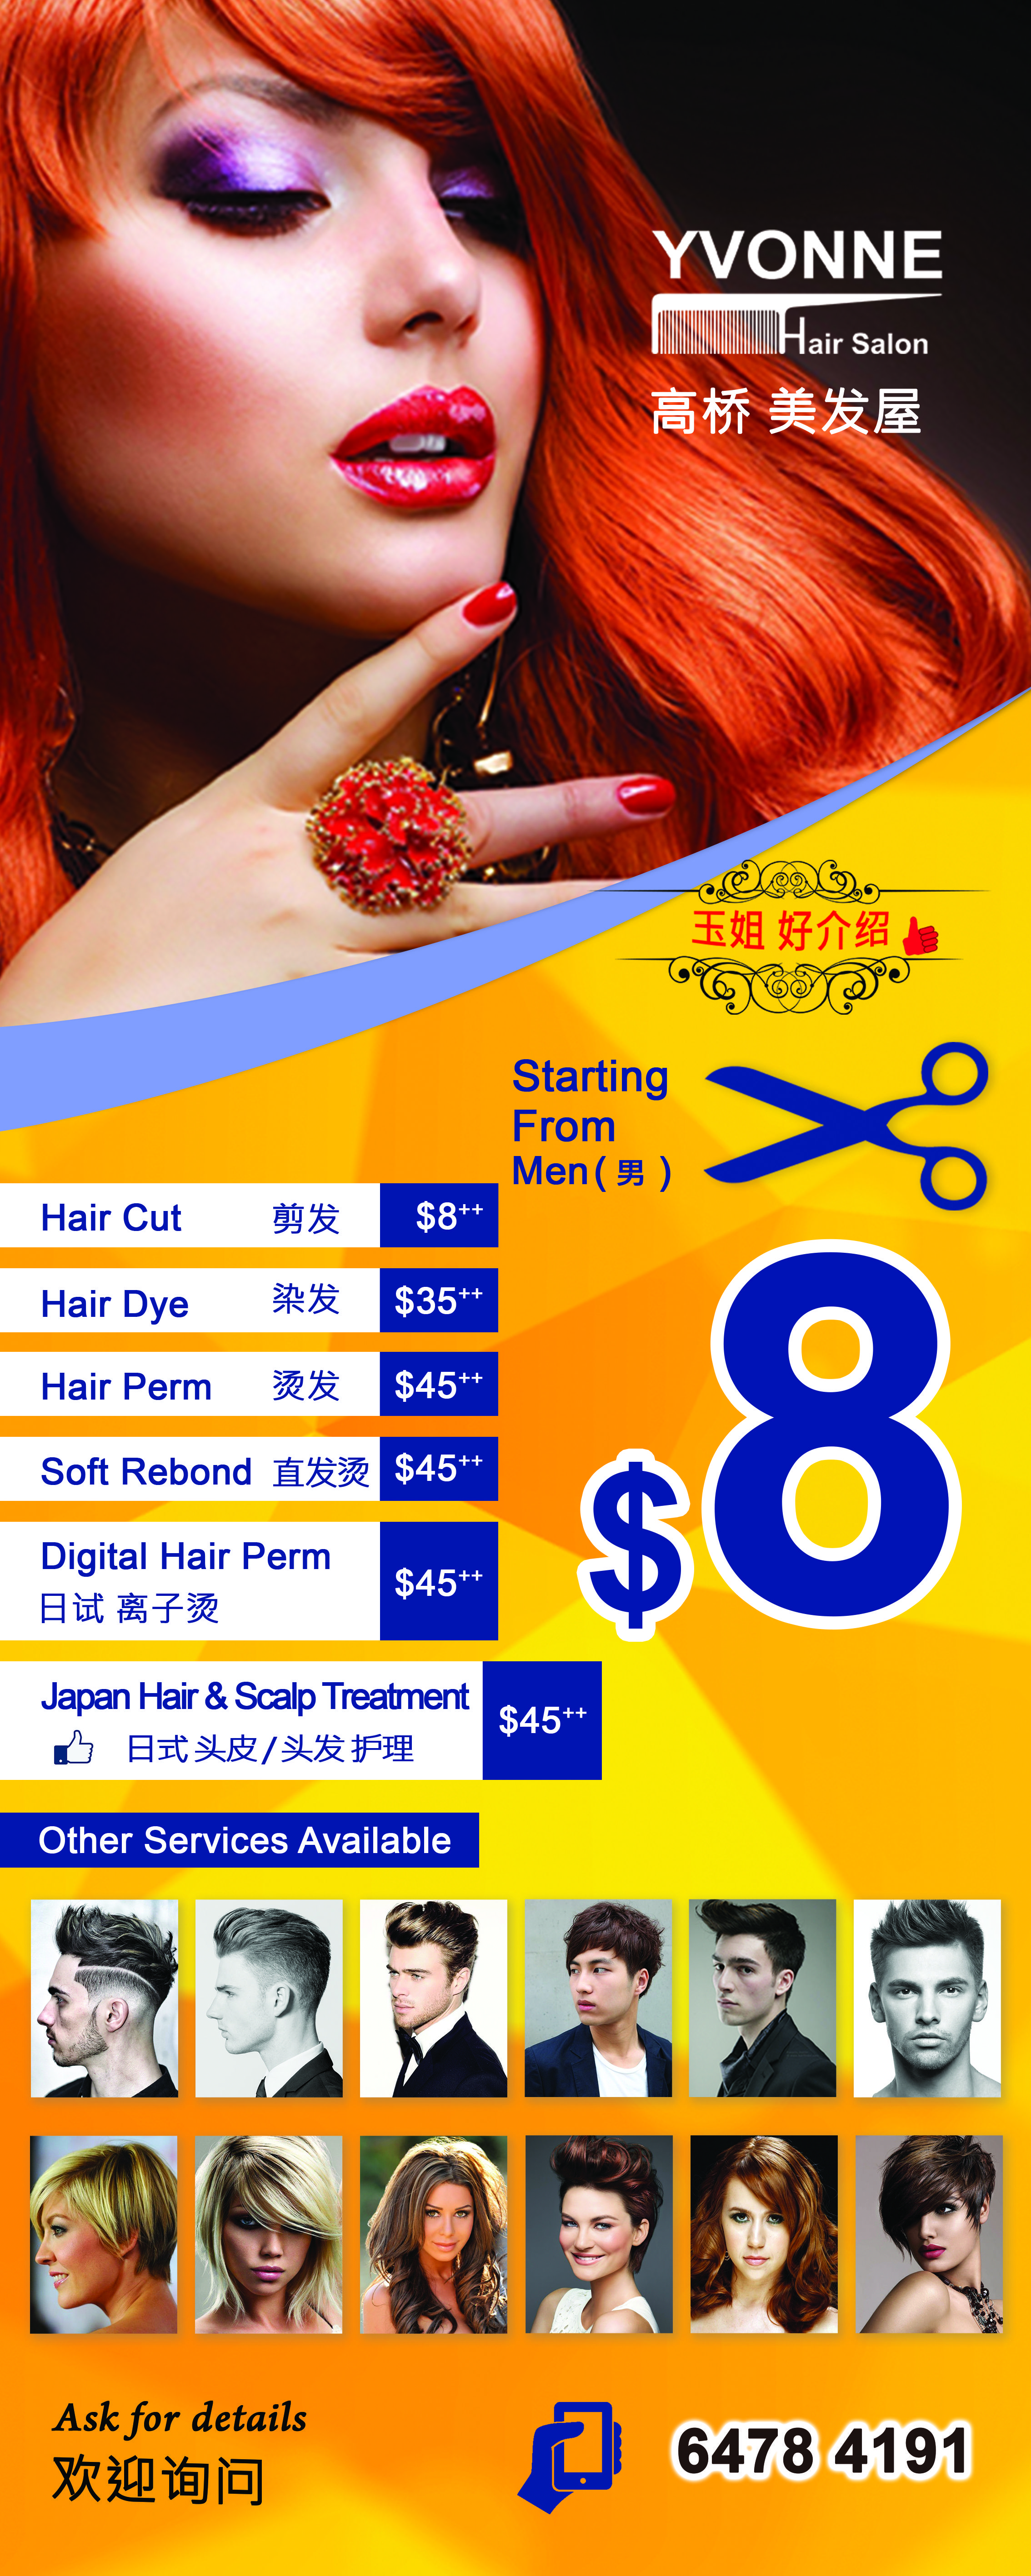 Hair Salon Roll Up Banner Dyed Hair Men Permed Hairstyles Hair Salon